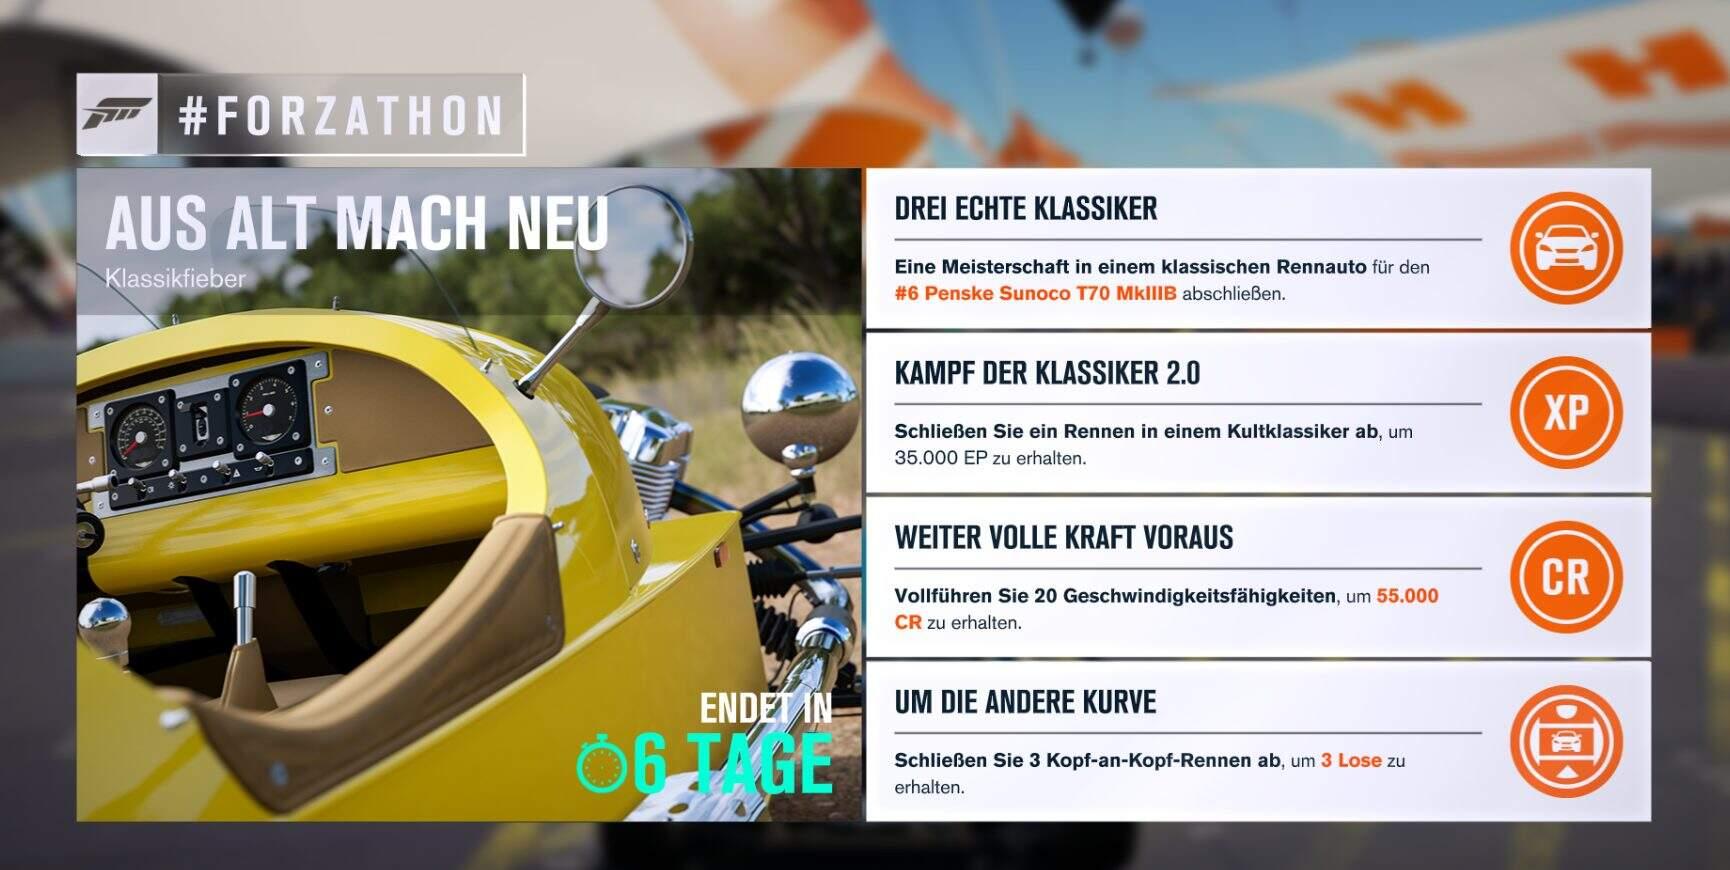 Forza Horizon 3 #Forzathon Guide KW 20 – Aus alt mach neu